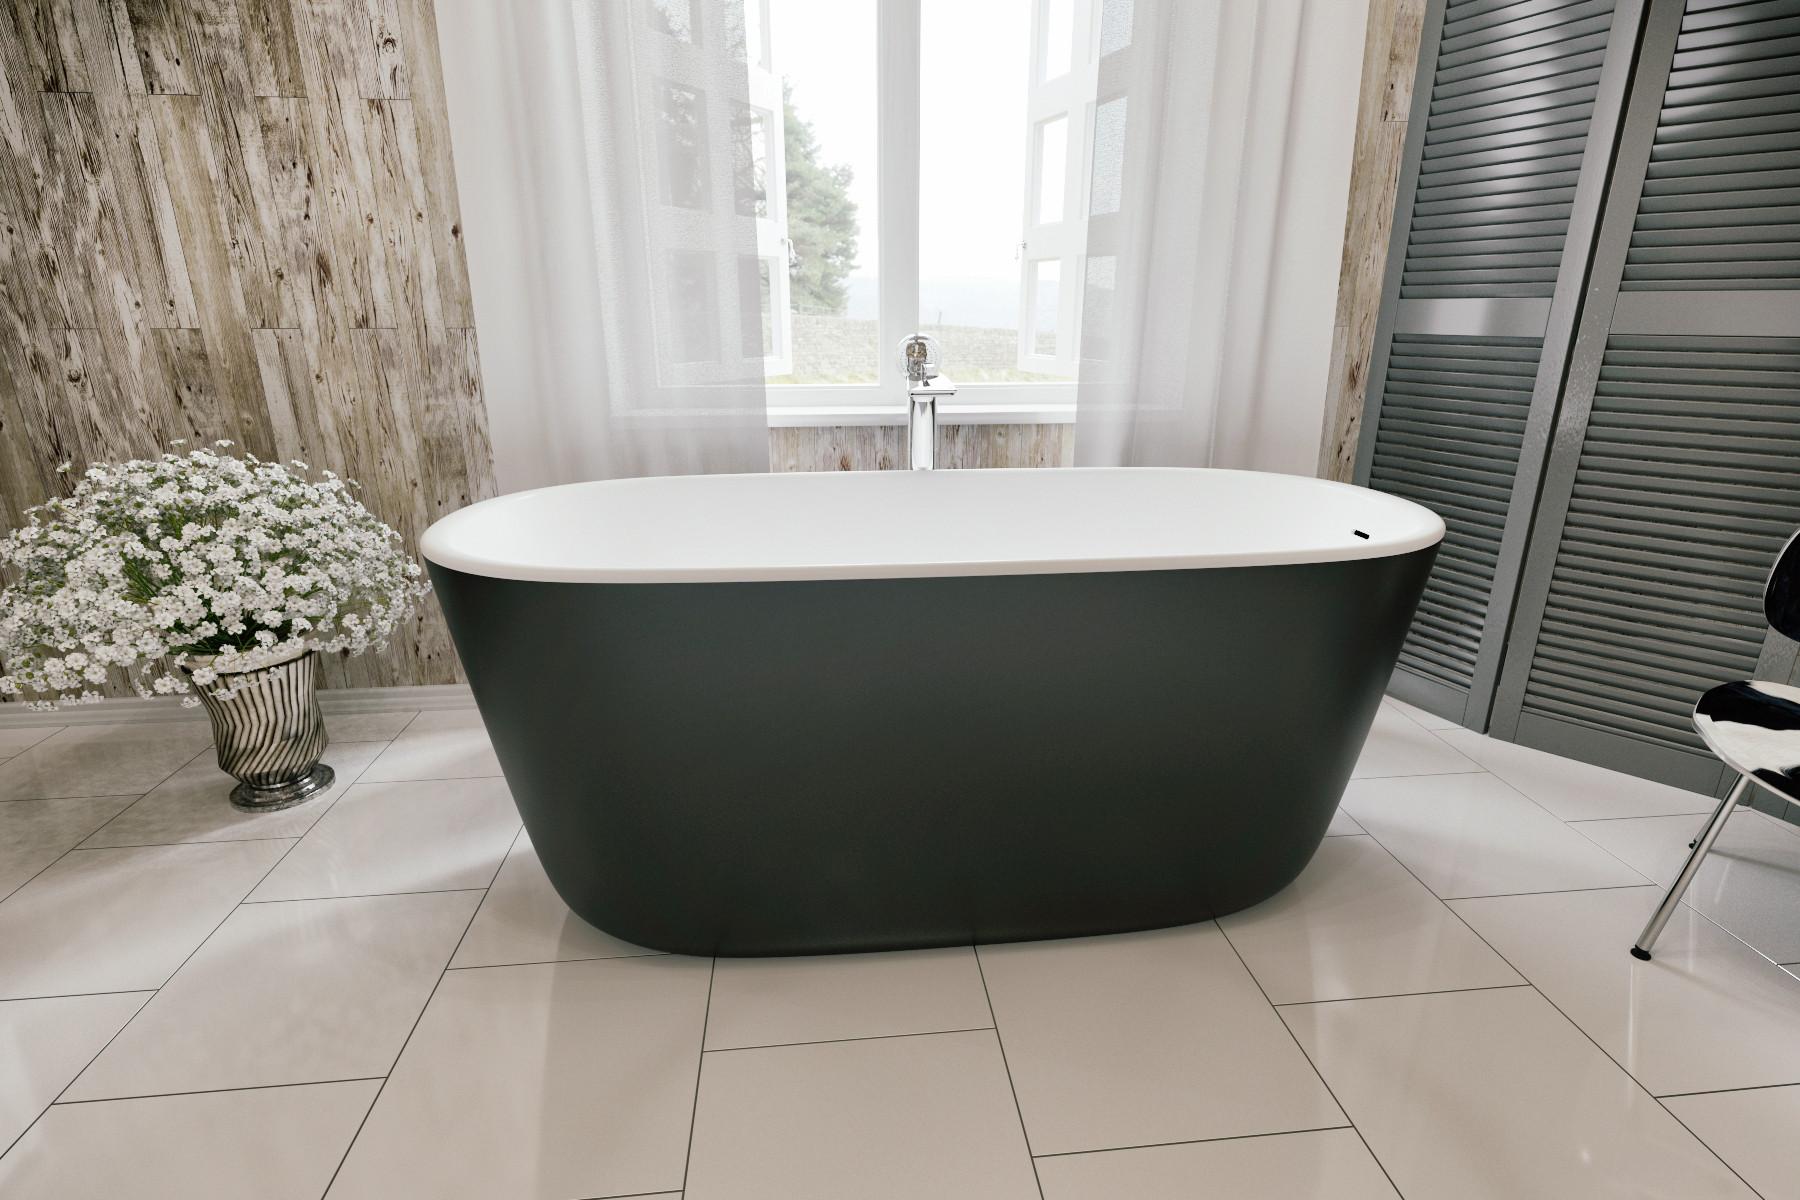 Aquatica PS602M-Mini-Blck-Wht Lullaby Free Standing Solid Surface Bathtub in Black